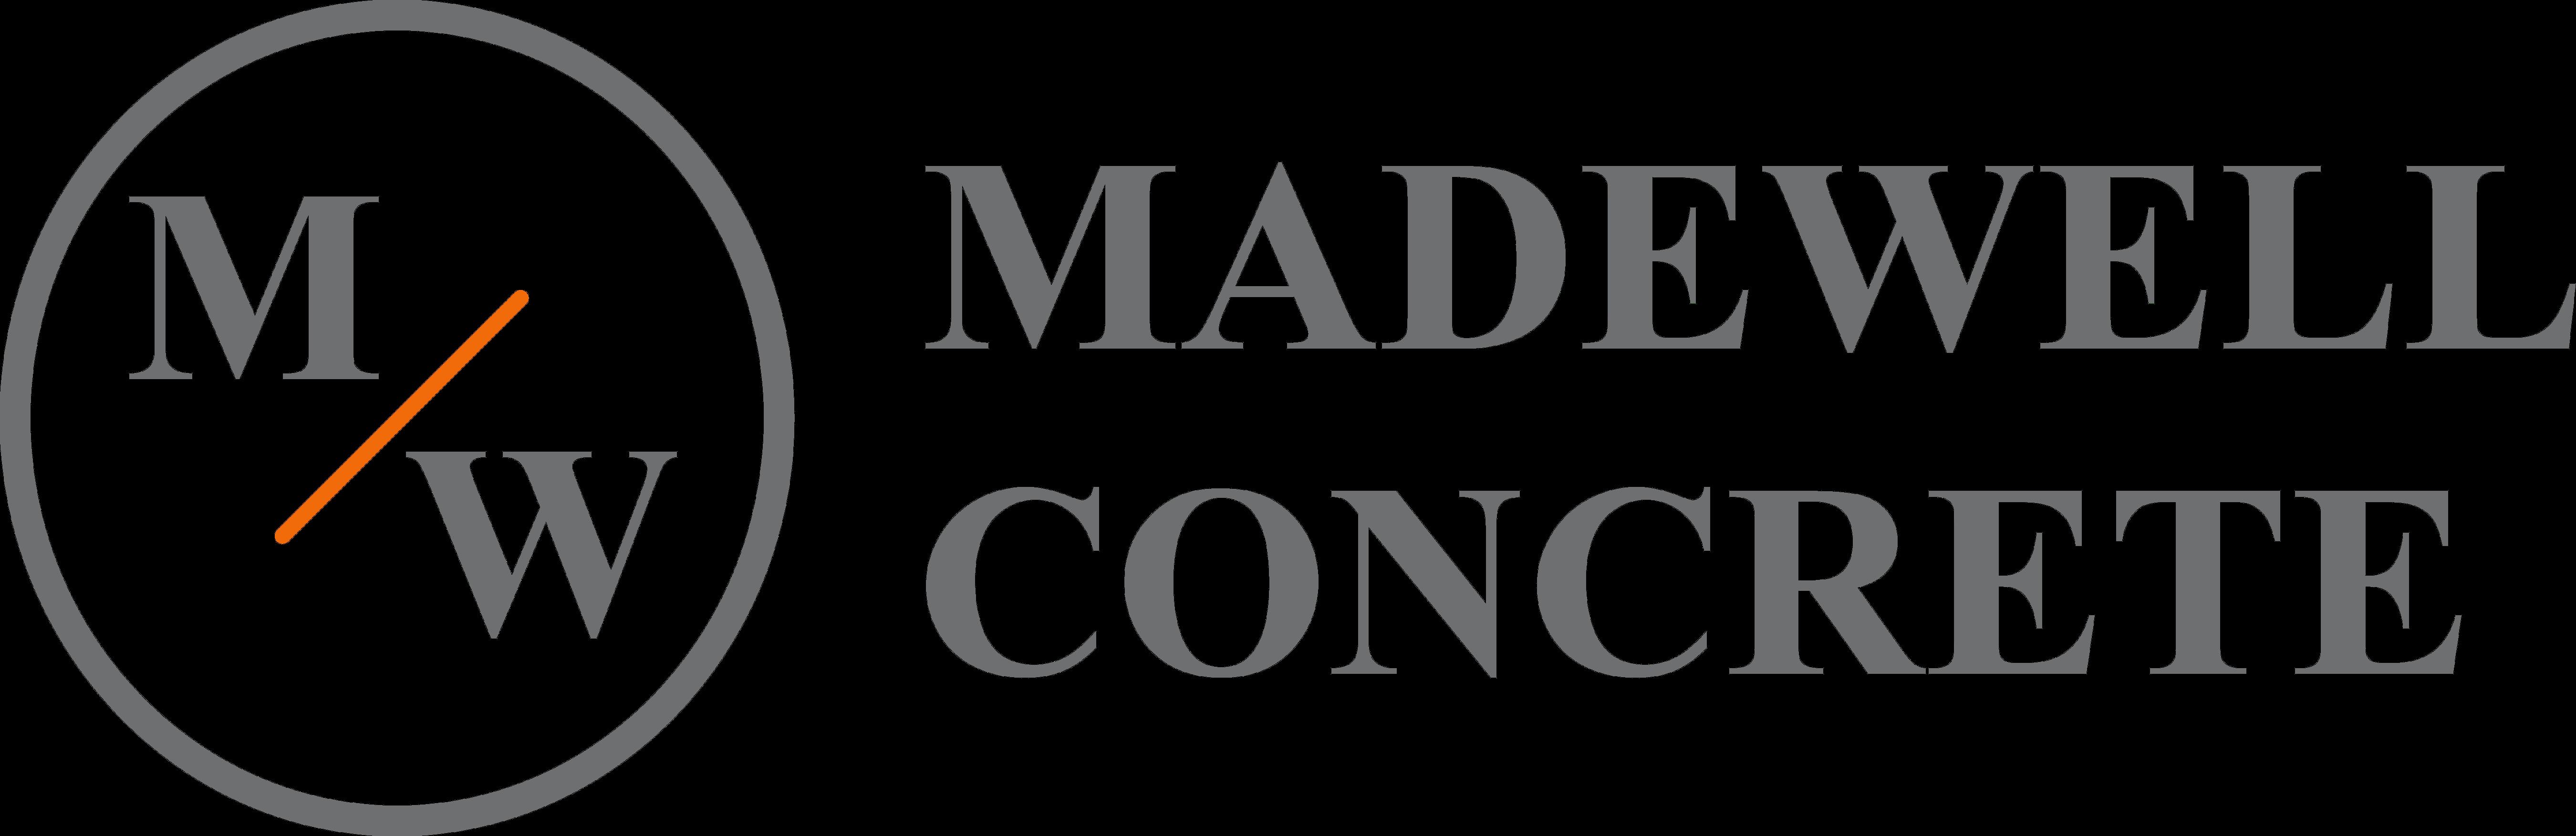 Madewell Concrete